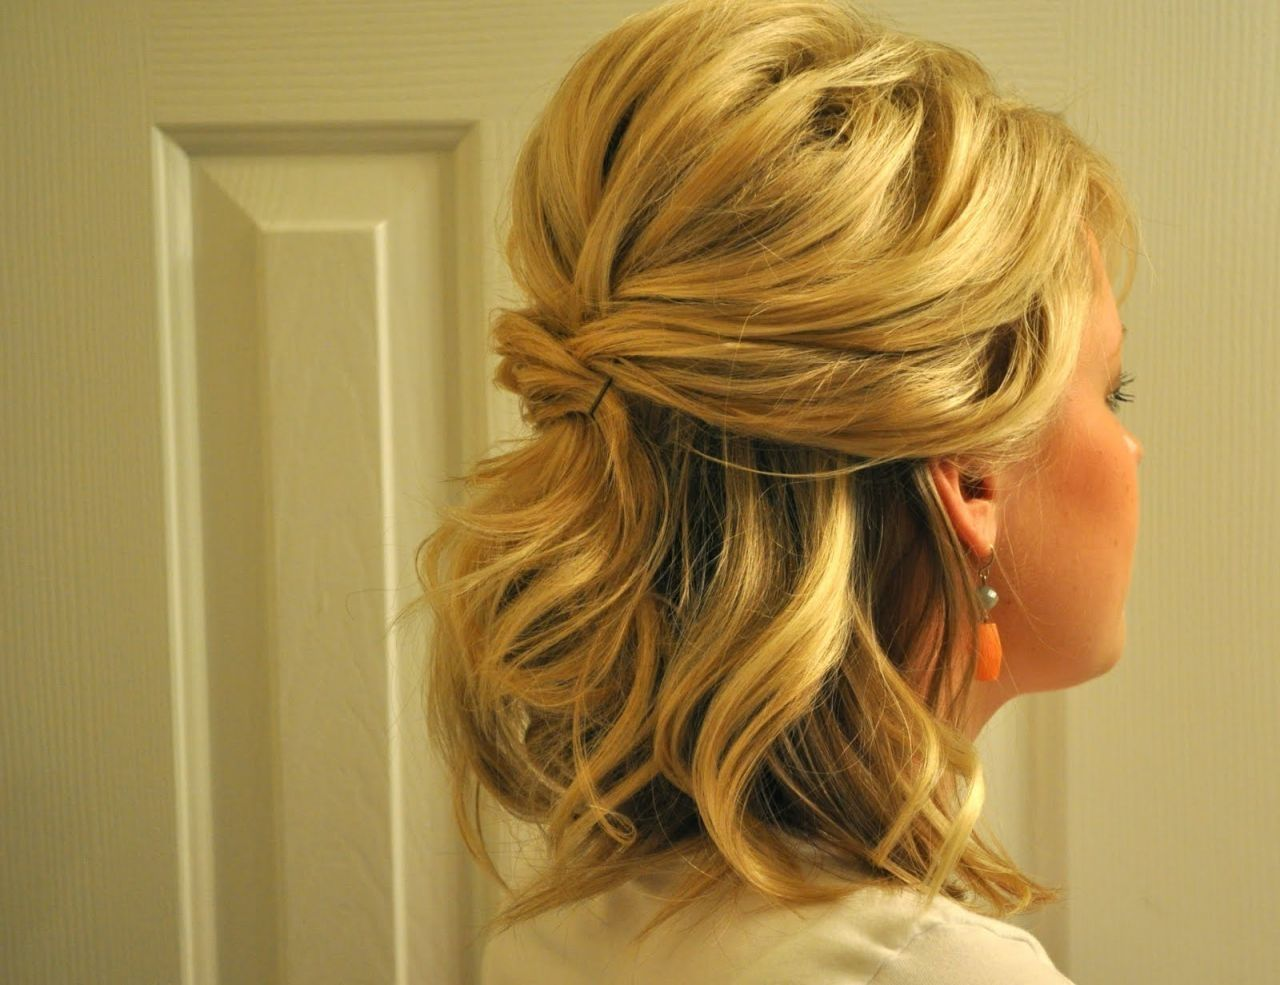 Updos For Medium Hair Half Up Half Down Half Up Half Down